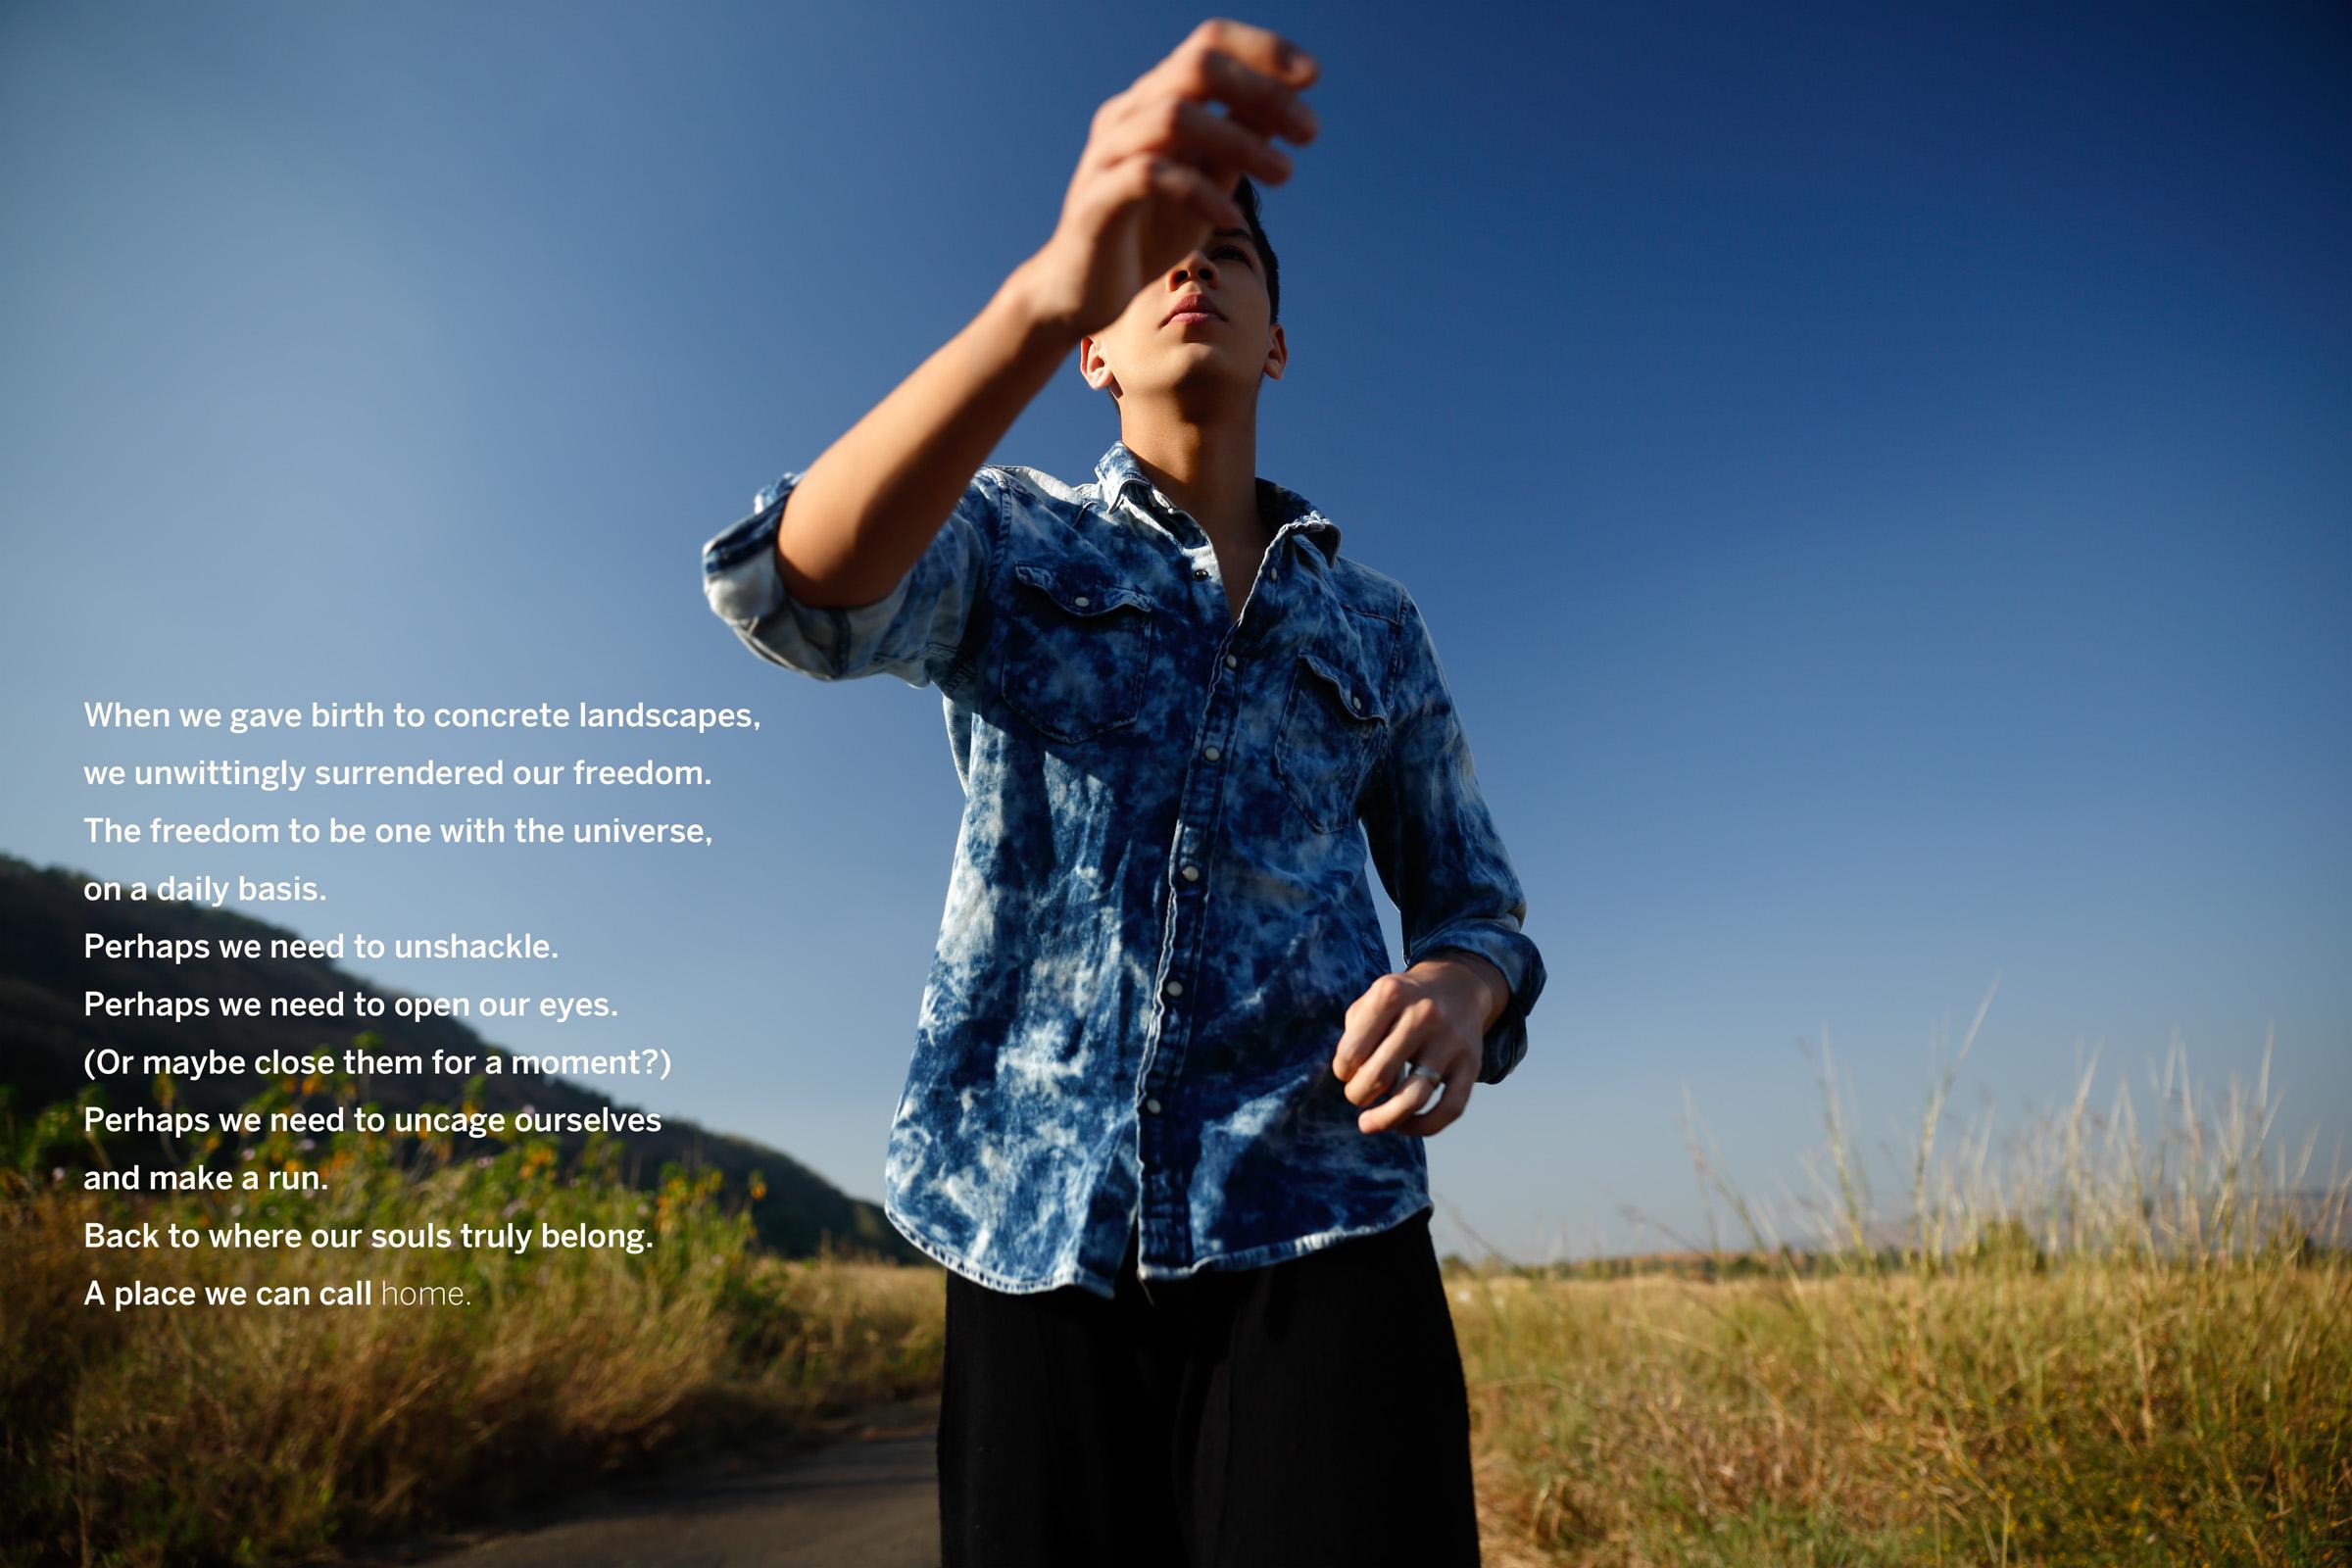 Kriator-Photographer-Country Roads_16.jpg